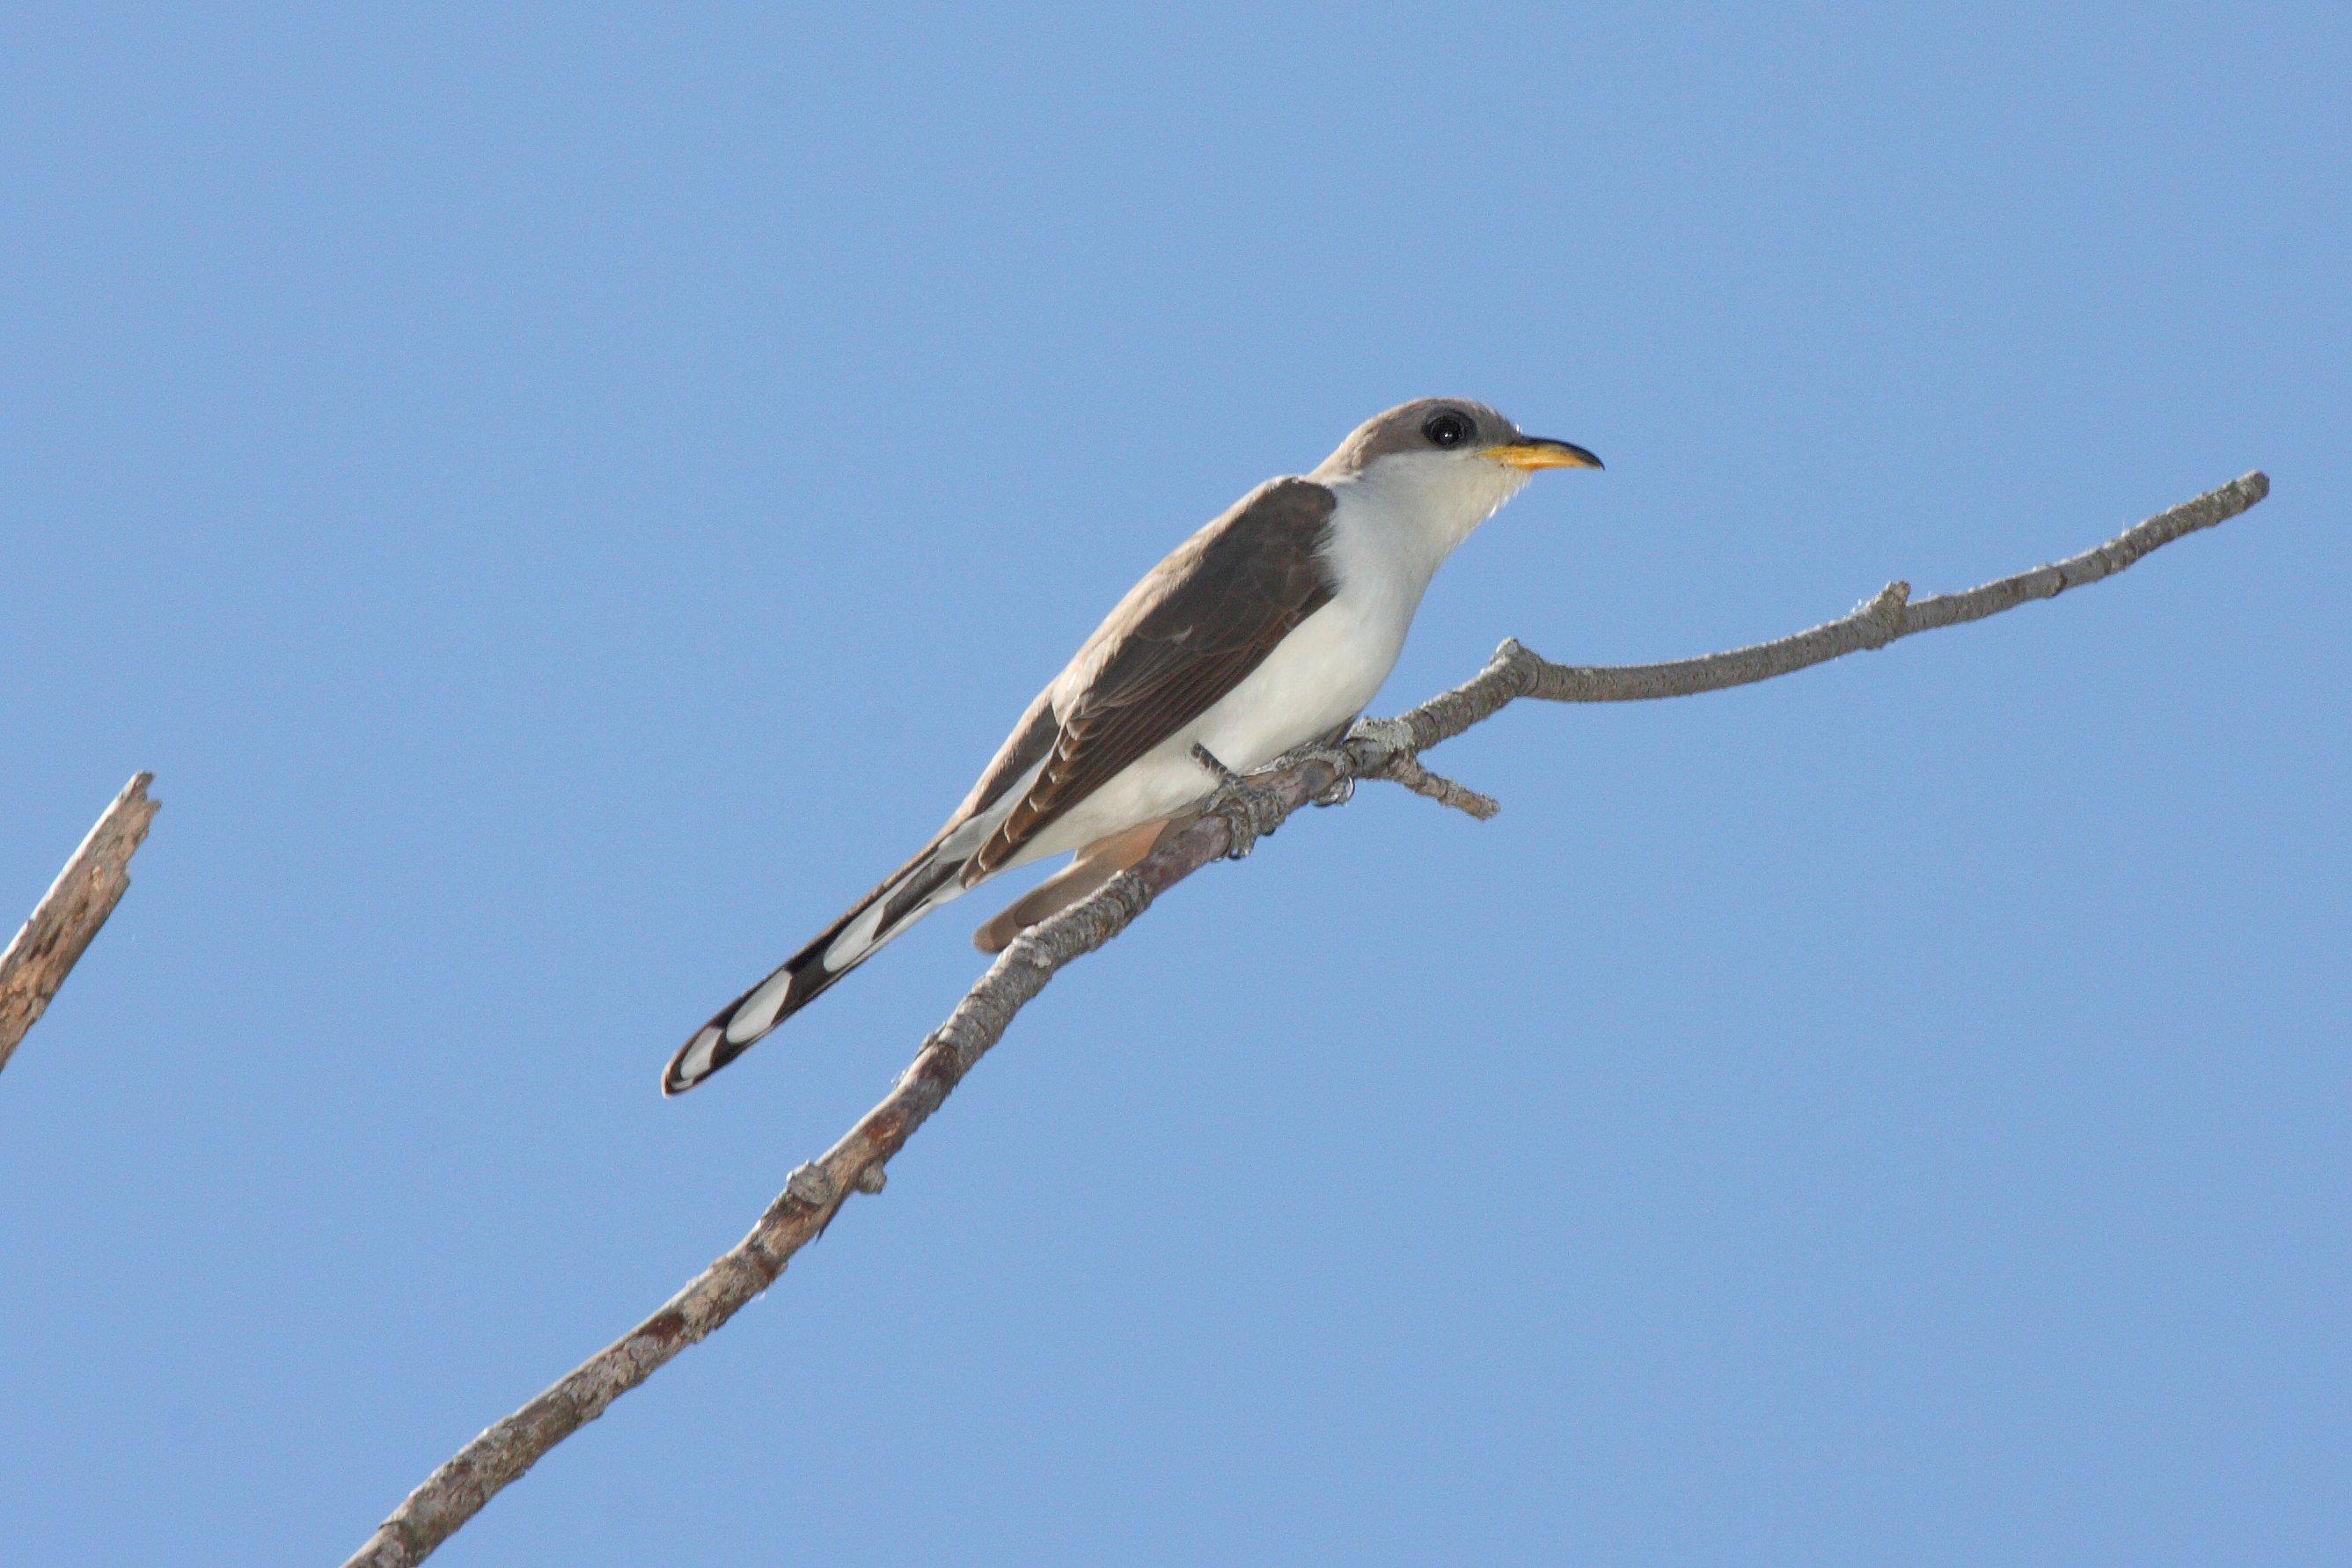 FileYellow Billed Cuckoo Coccyzus Americanus 5822528612